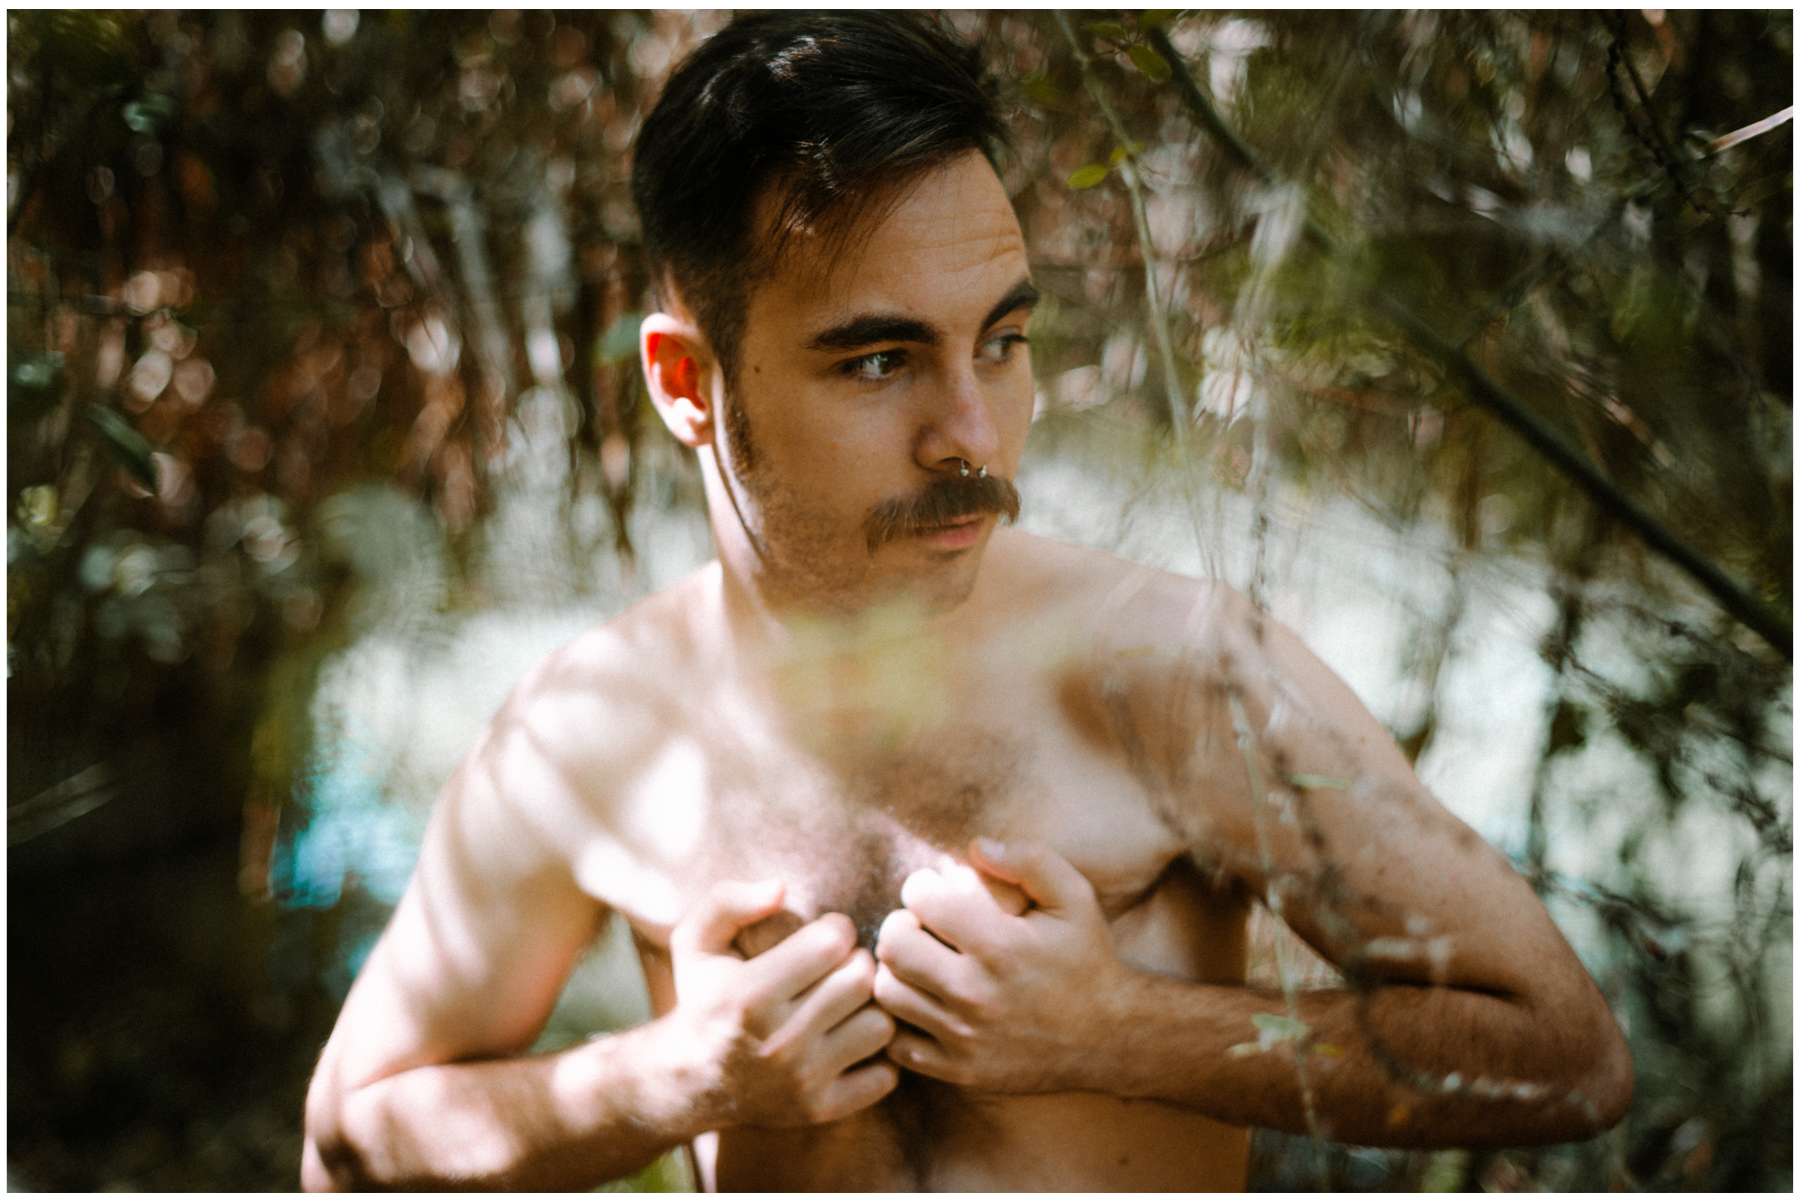 Andi-Retrato-Jose-Angel-Fotografia-245.jpg